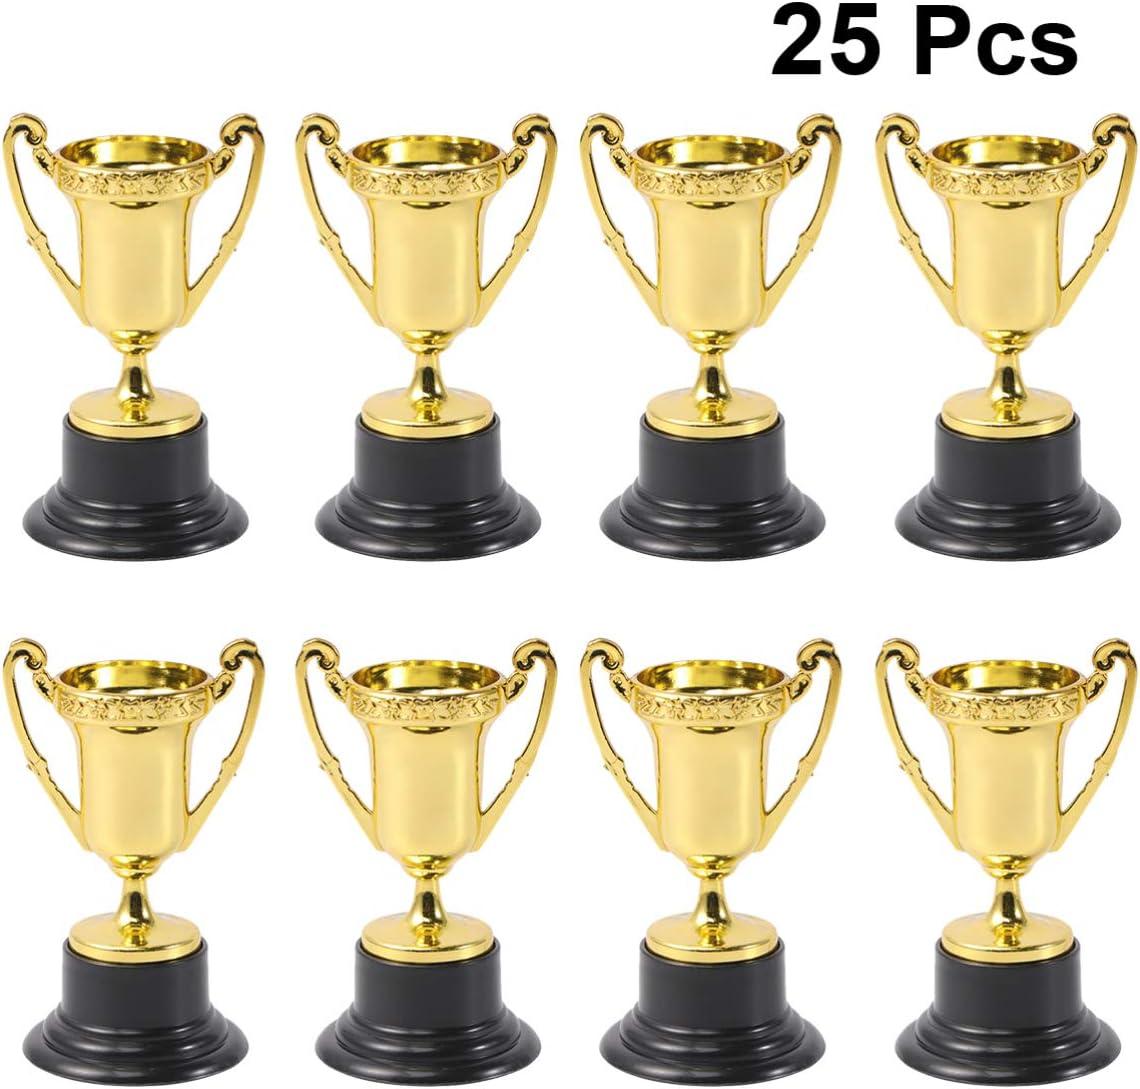 LIOOBO 25pcs Mini Trophy Plastic Durable Safe Premium Winner Awards Plaything Competitions Testimonial